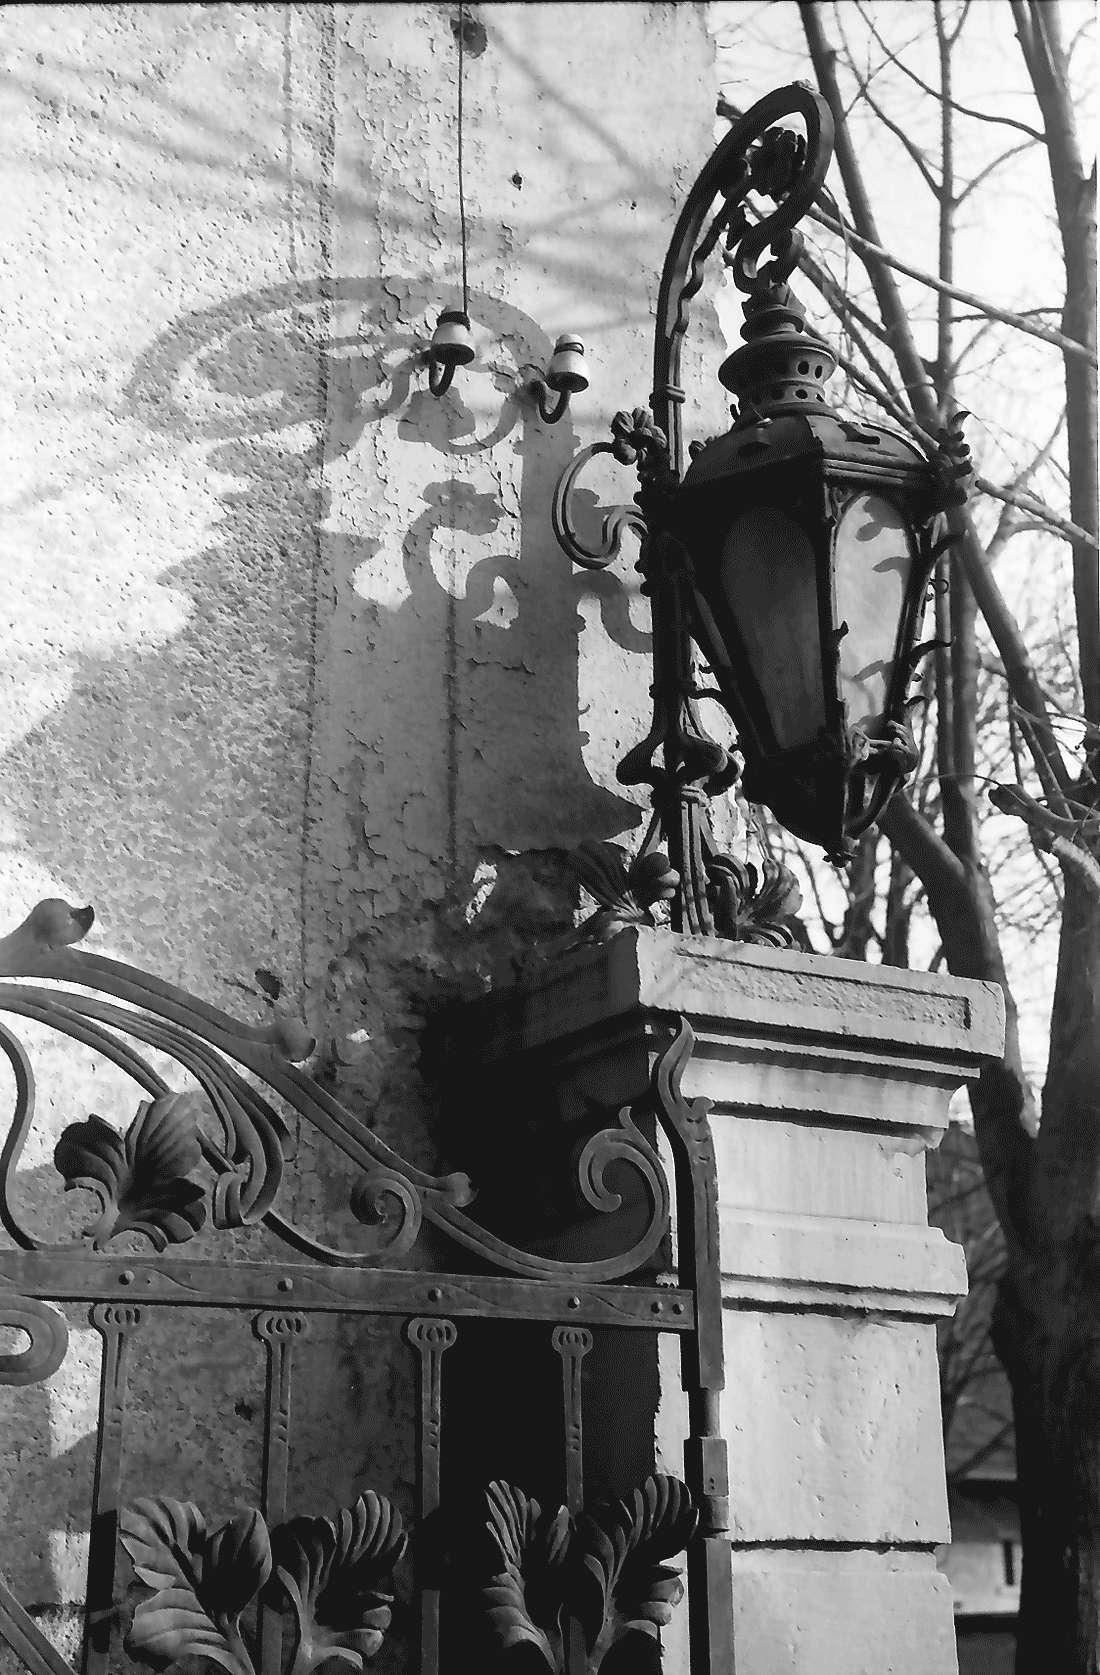 Feldkirch: Alte Laterne am Eingang, Bild 2